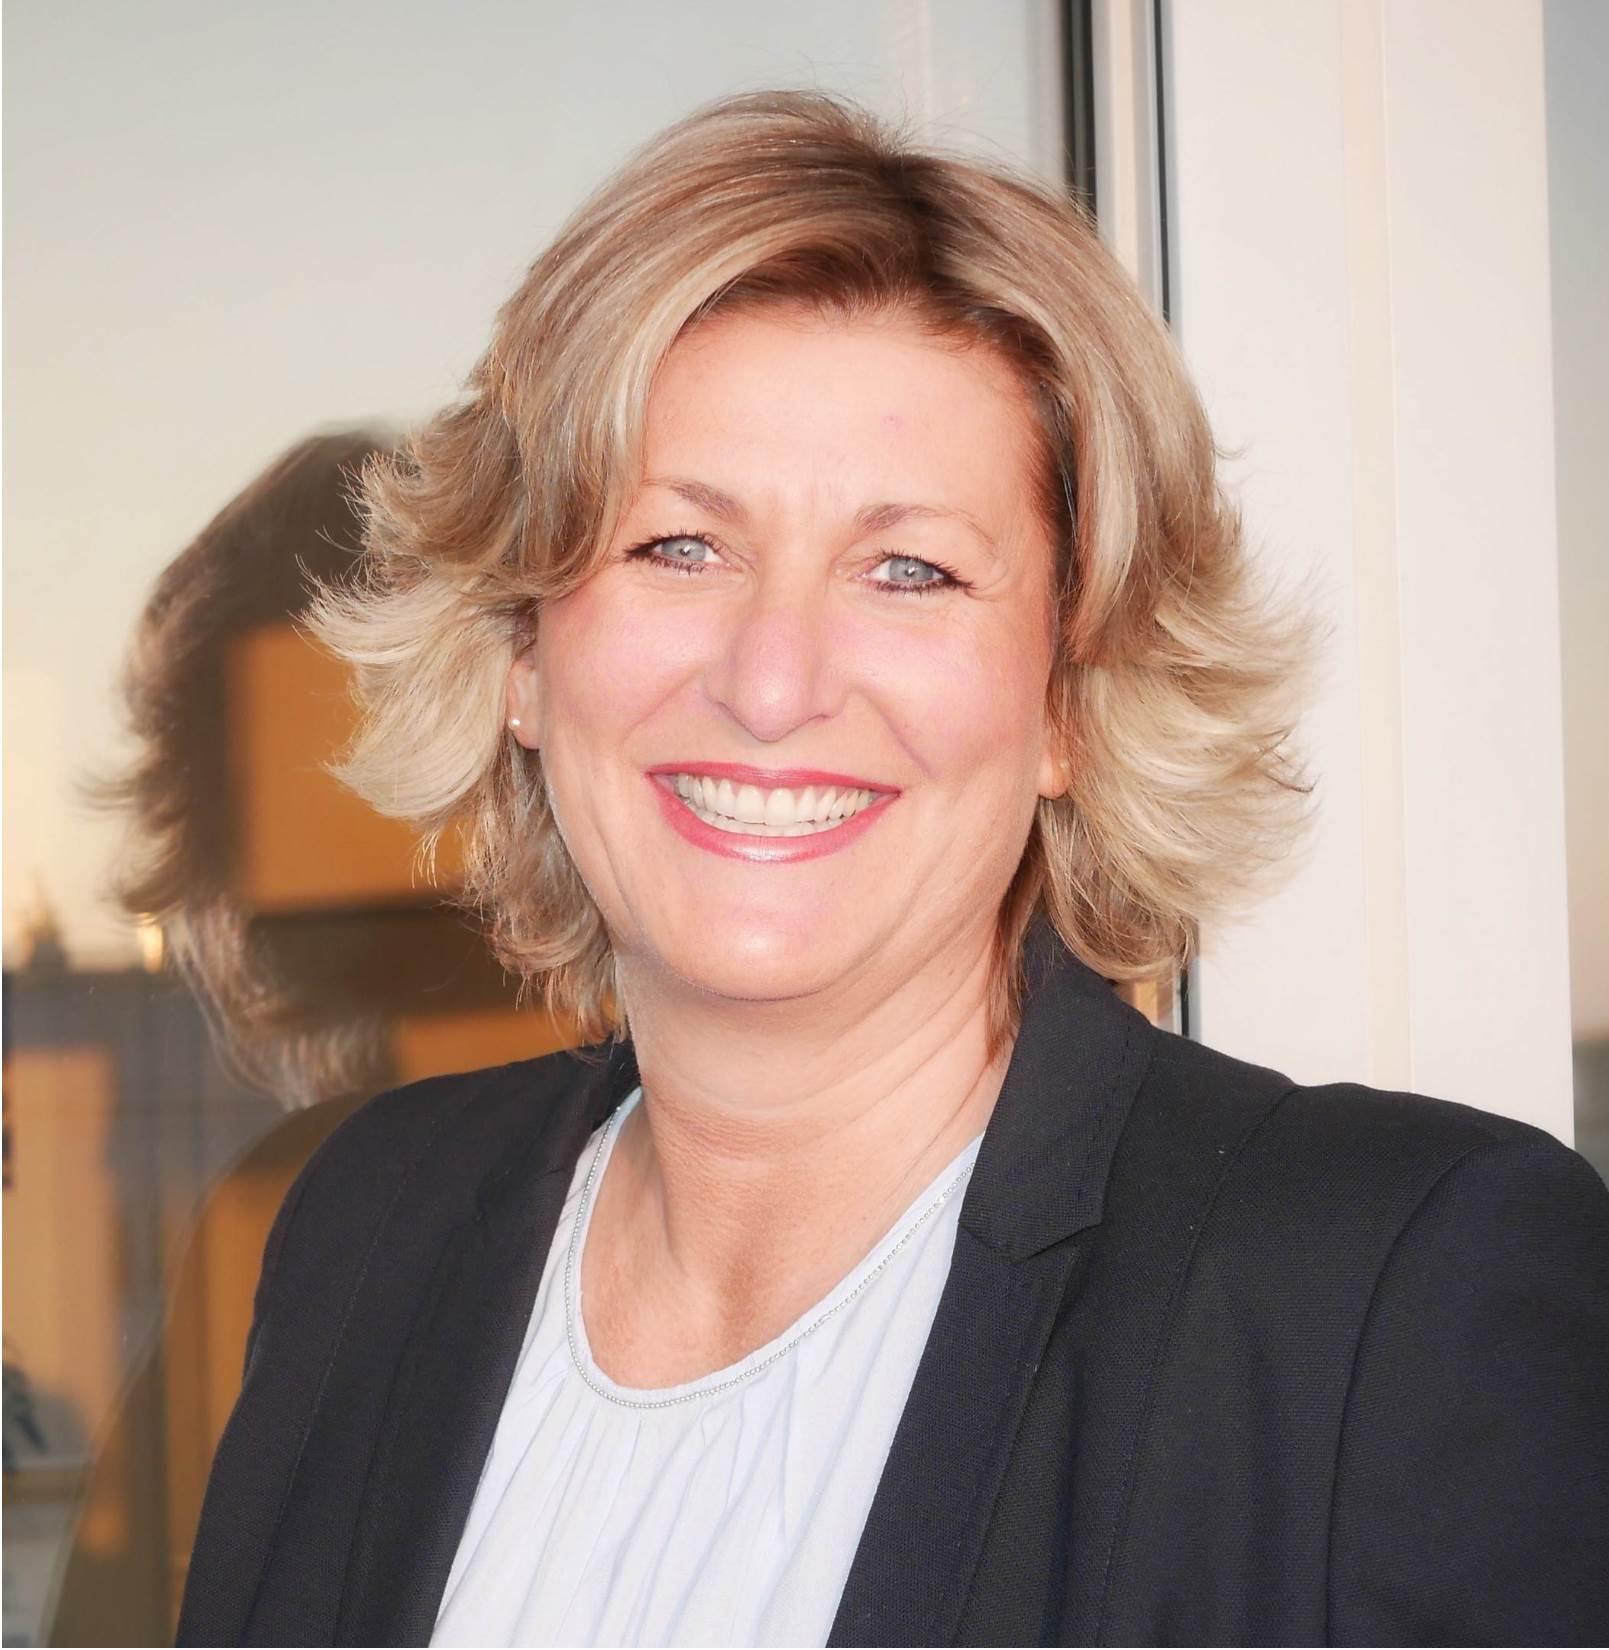 Stefanie Lindo